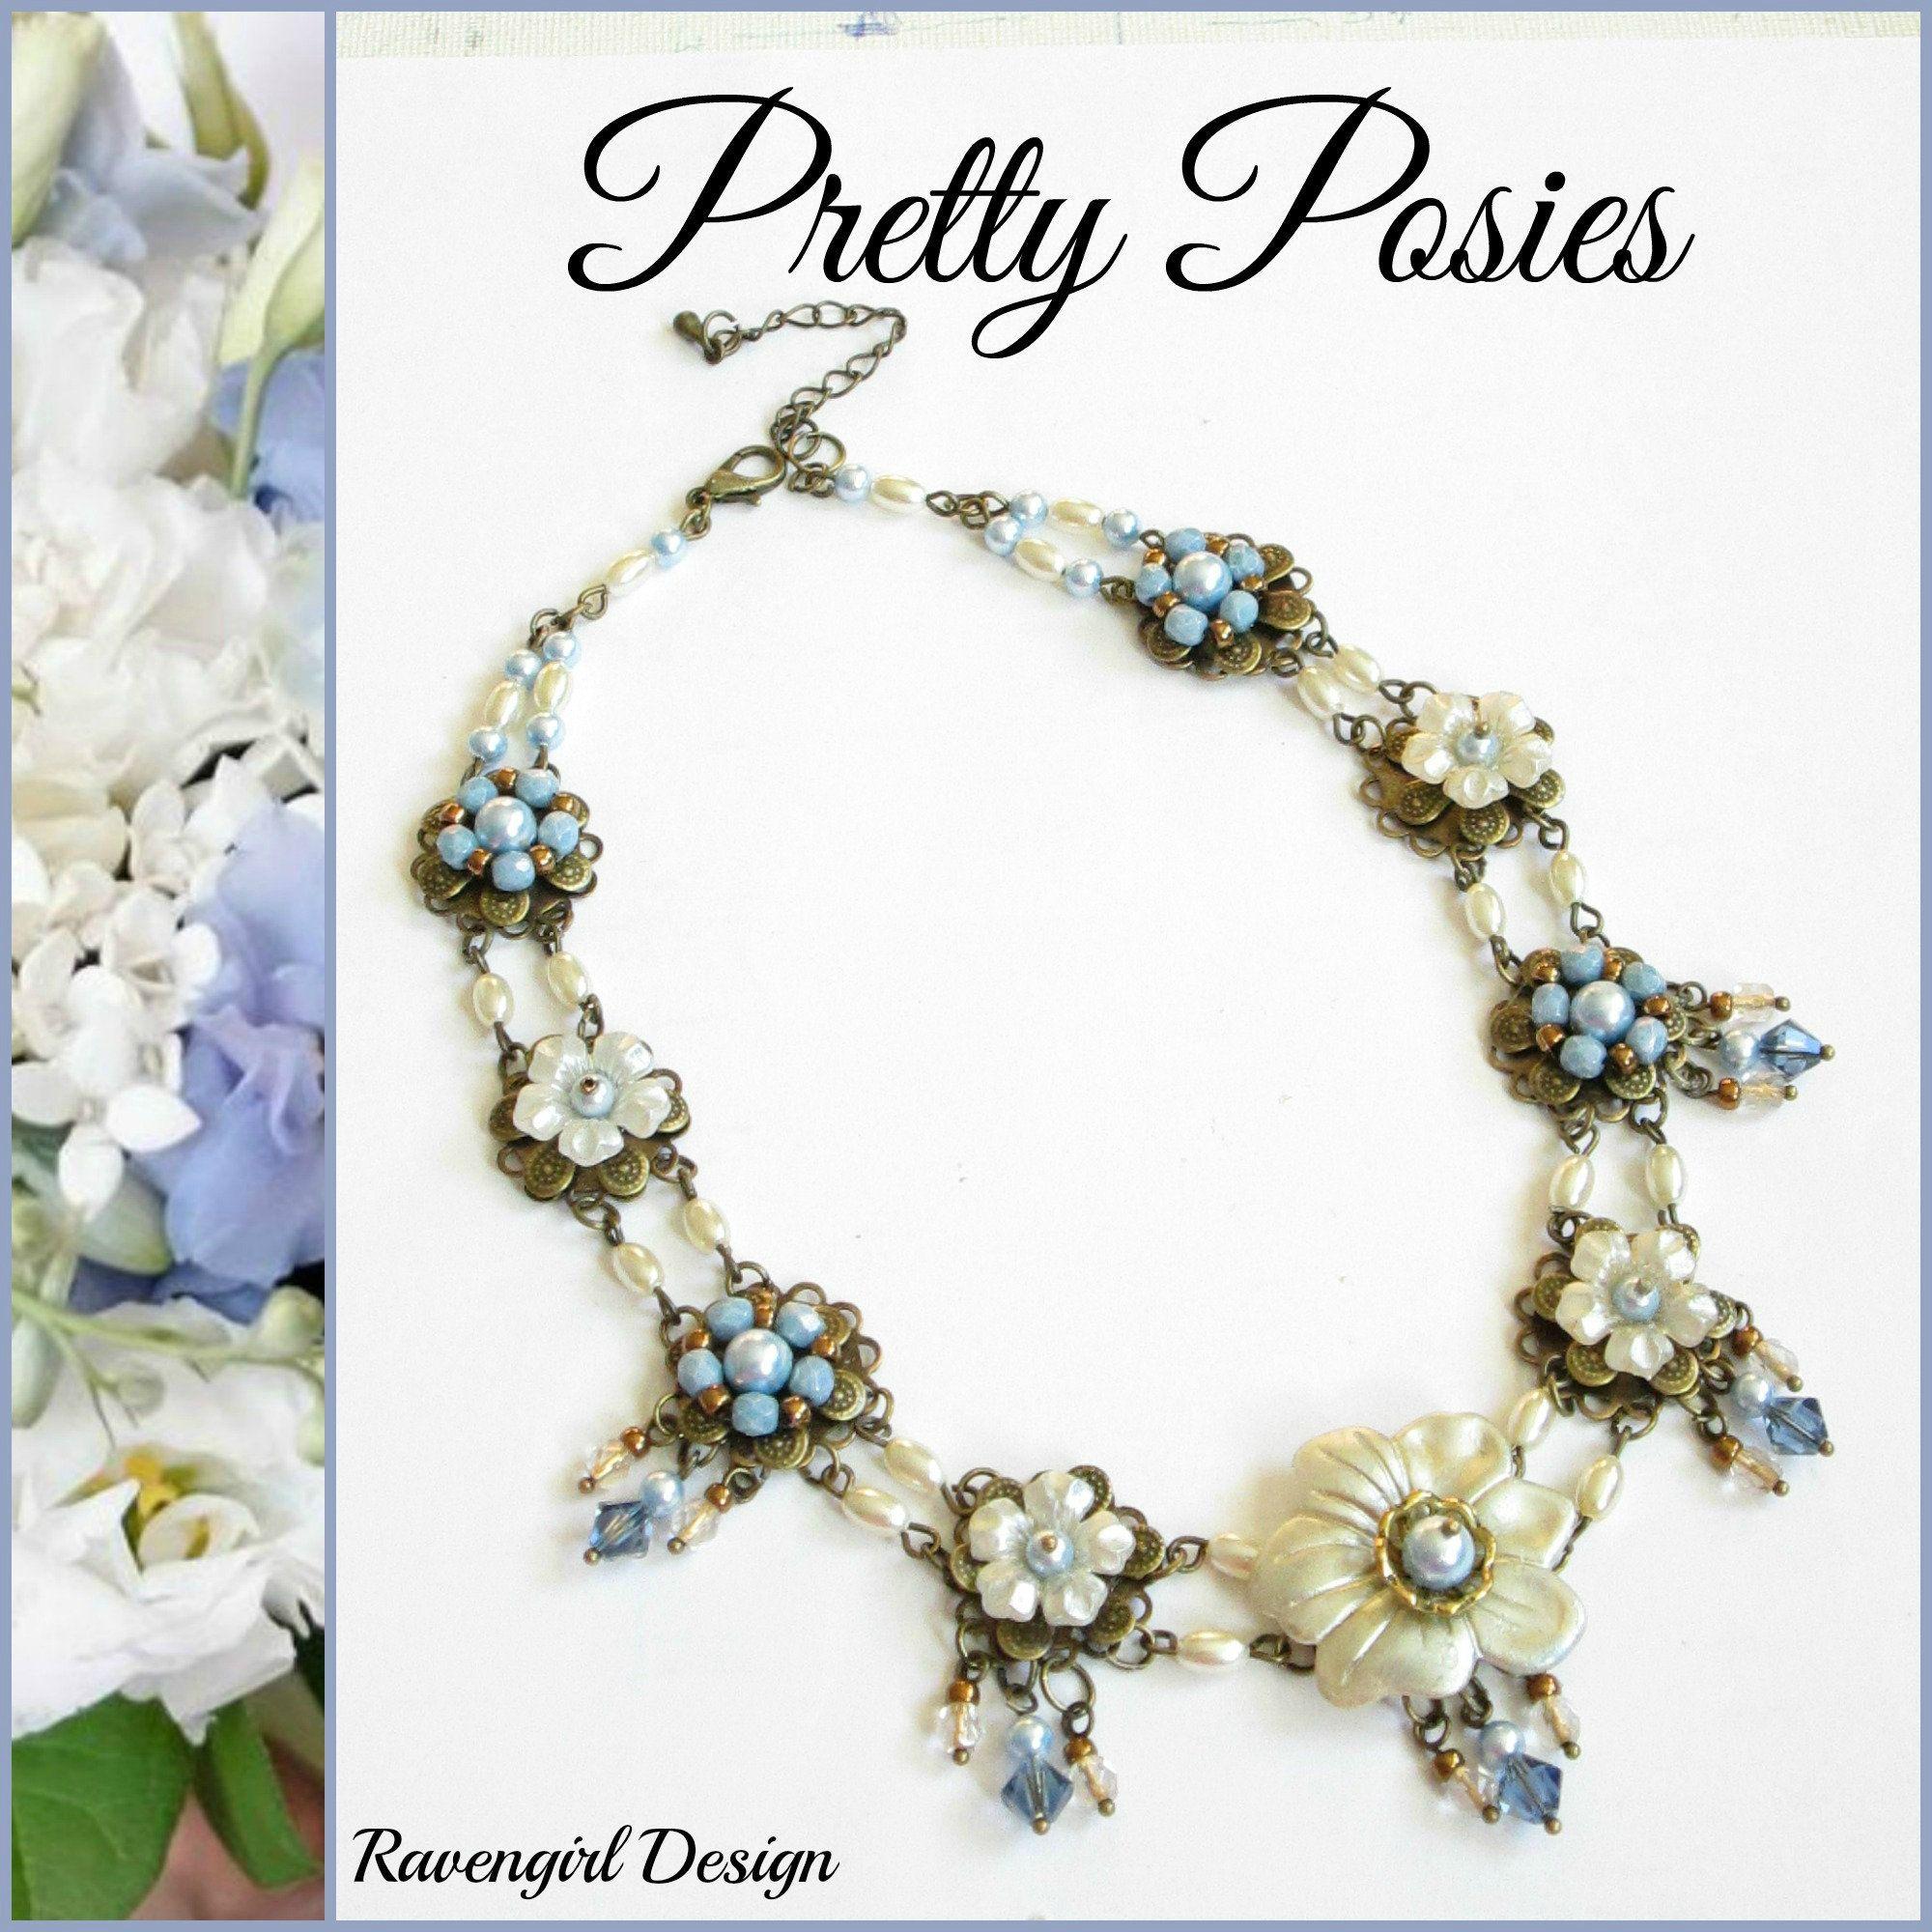 AUTUMN HUES Vintage Style Flower Earrings Ravengirl Copper Coral Green Earrings Hand Painted Earrings Long Dangle Victorian Earrings